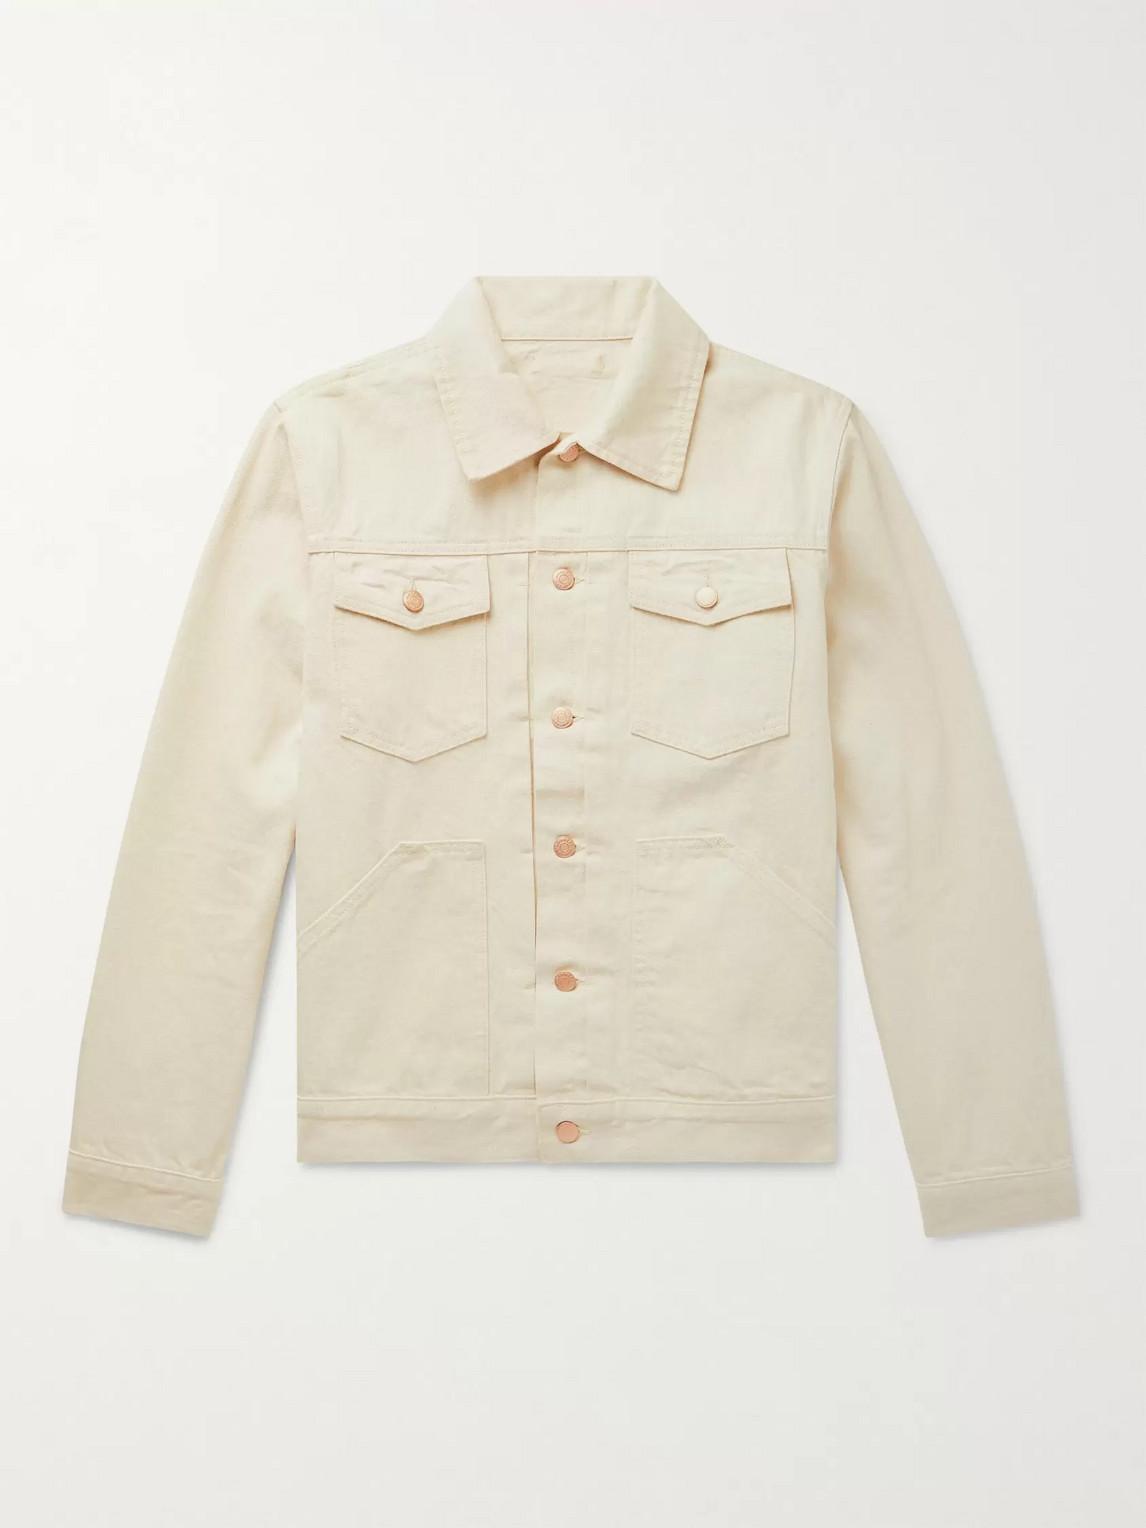 The Workers Club Selvedge Denim Jacket In Neutrals